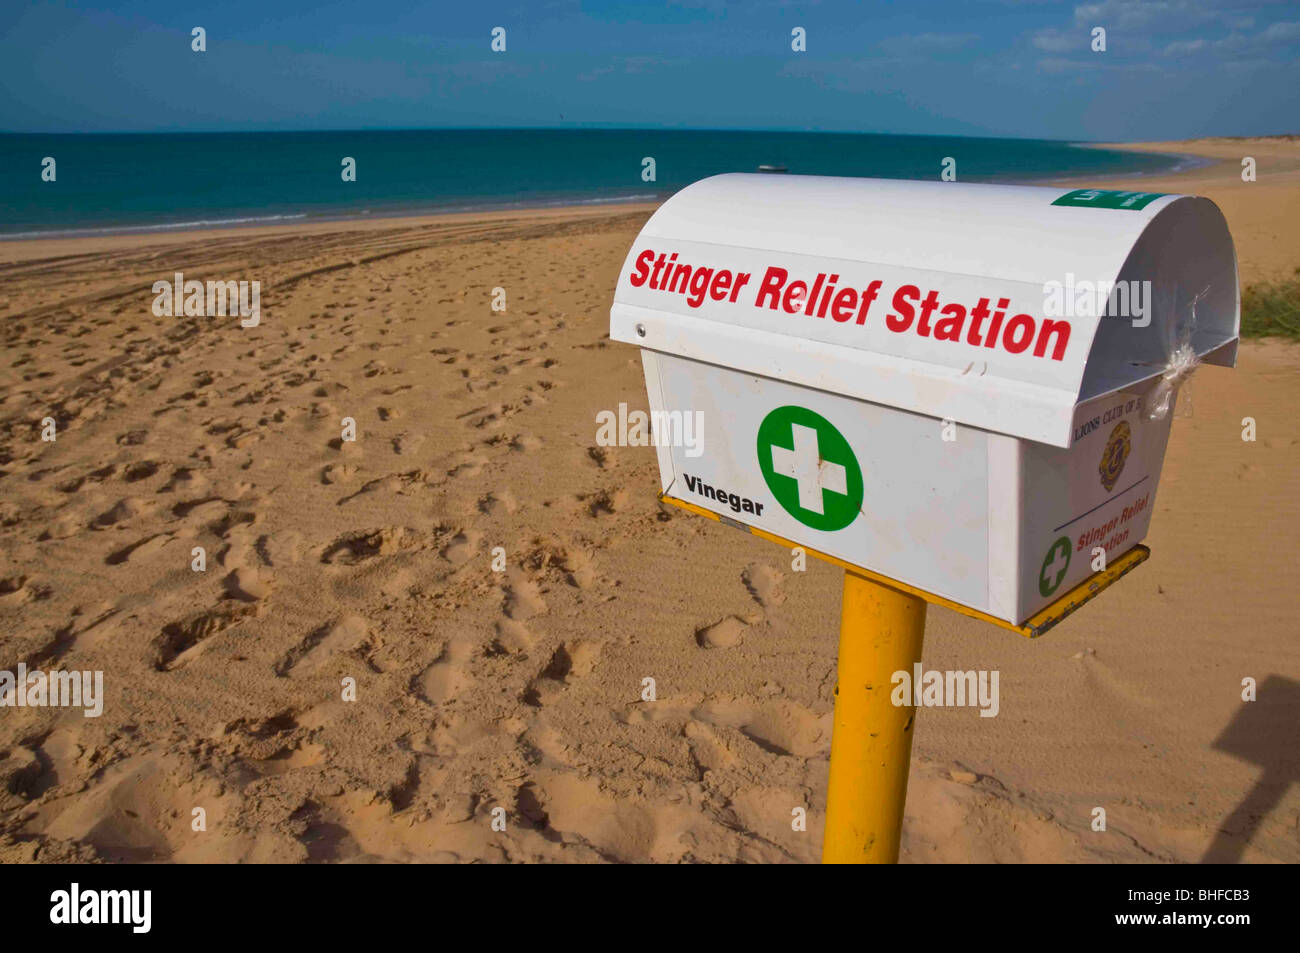 Marine stinger relief station in The Kimberley region of Western Australia - Stock Image